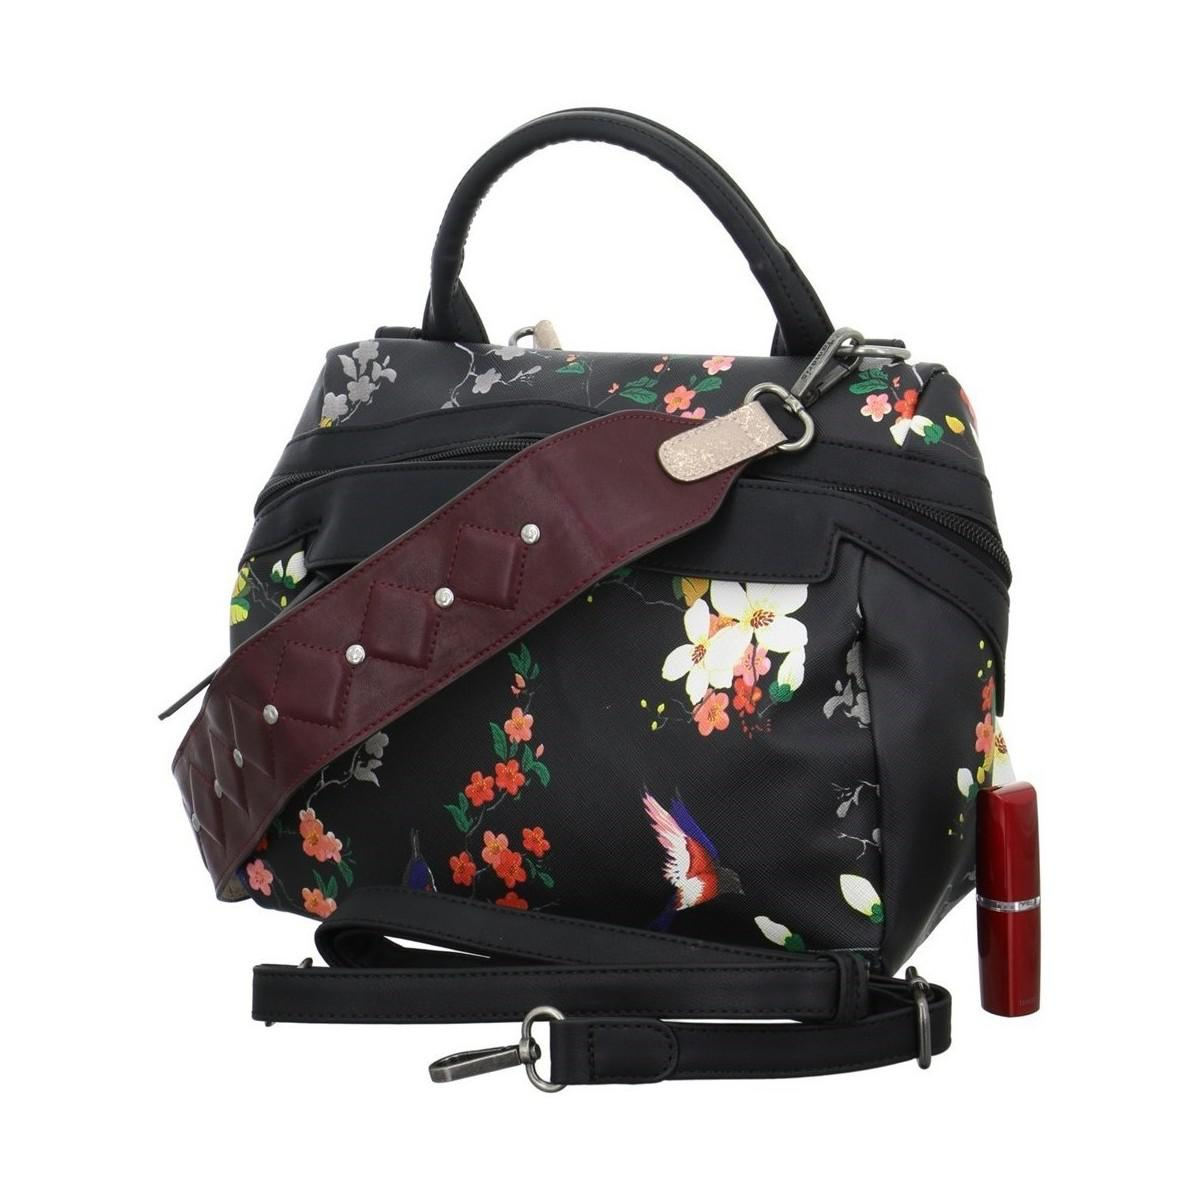 In Bag Lyst Black Ava Tamaris Bowling Handbags Women's wBXxvS6q8